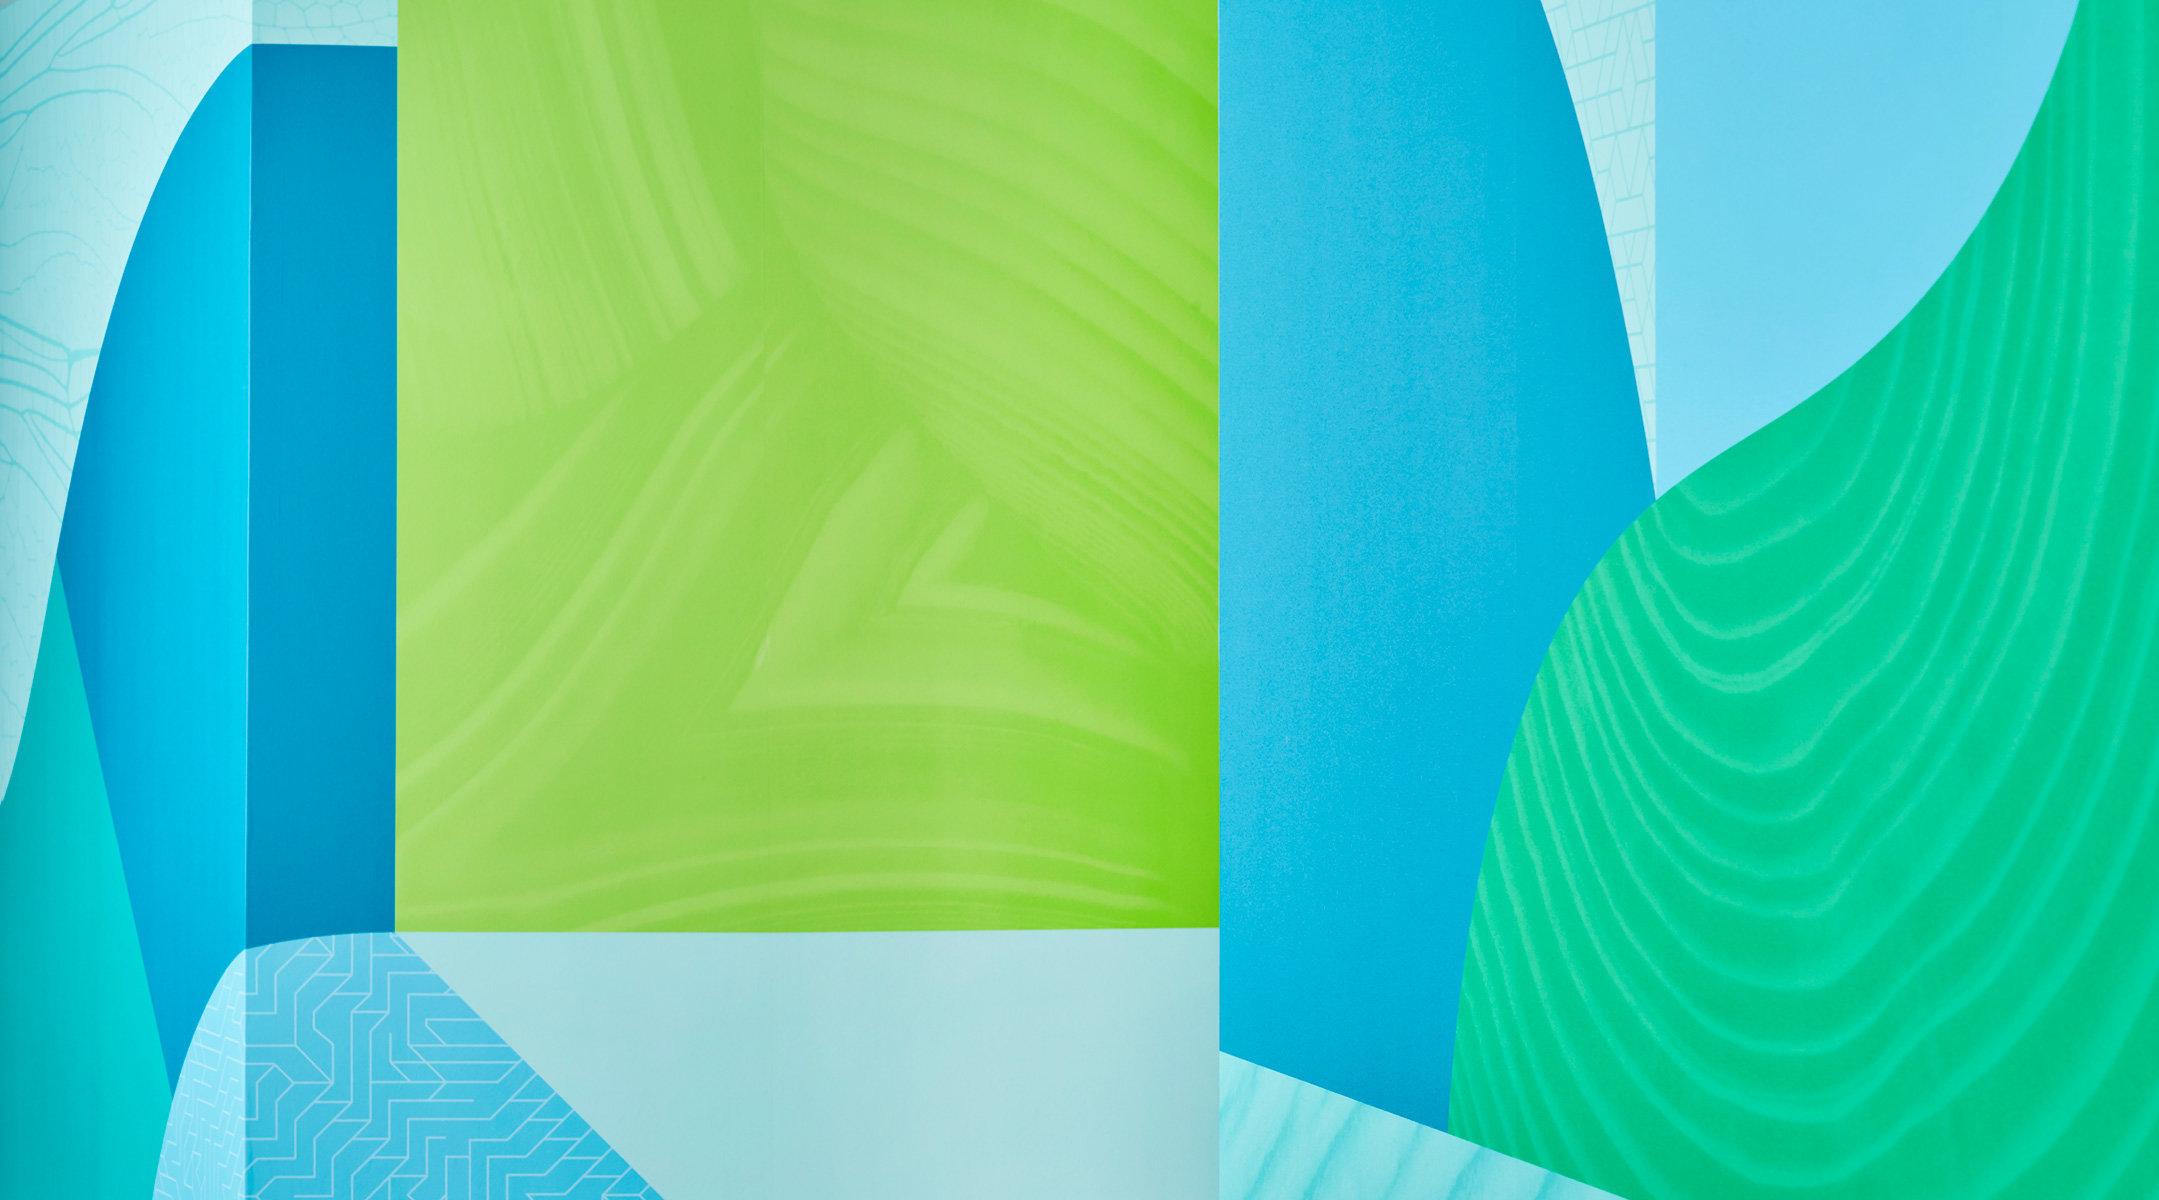 chadkouri-sproutsocial-mural-side-detail2